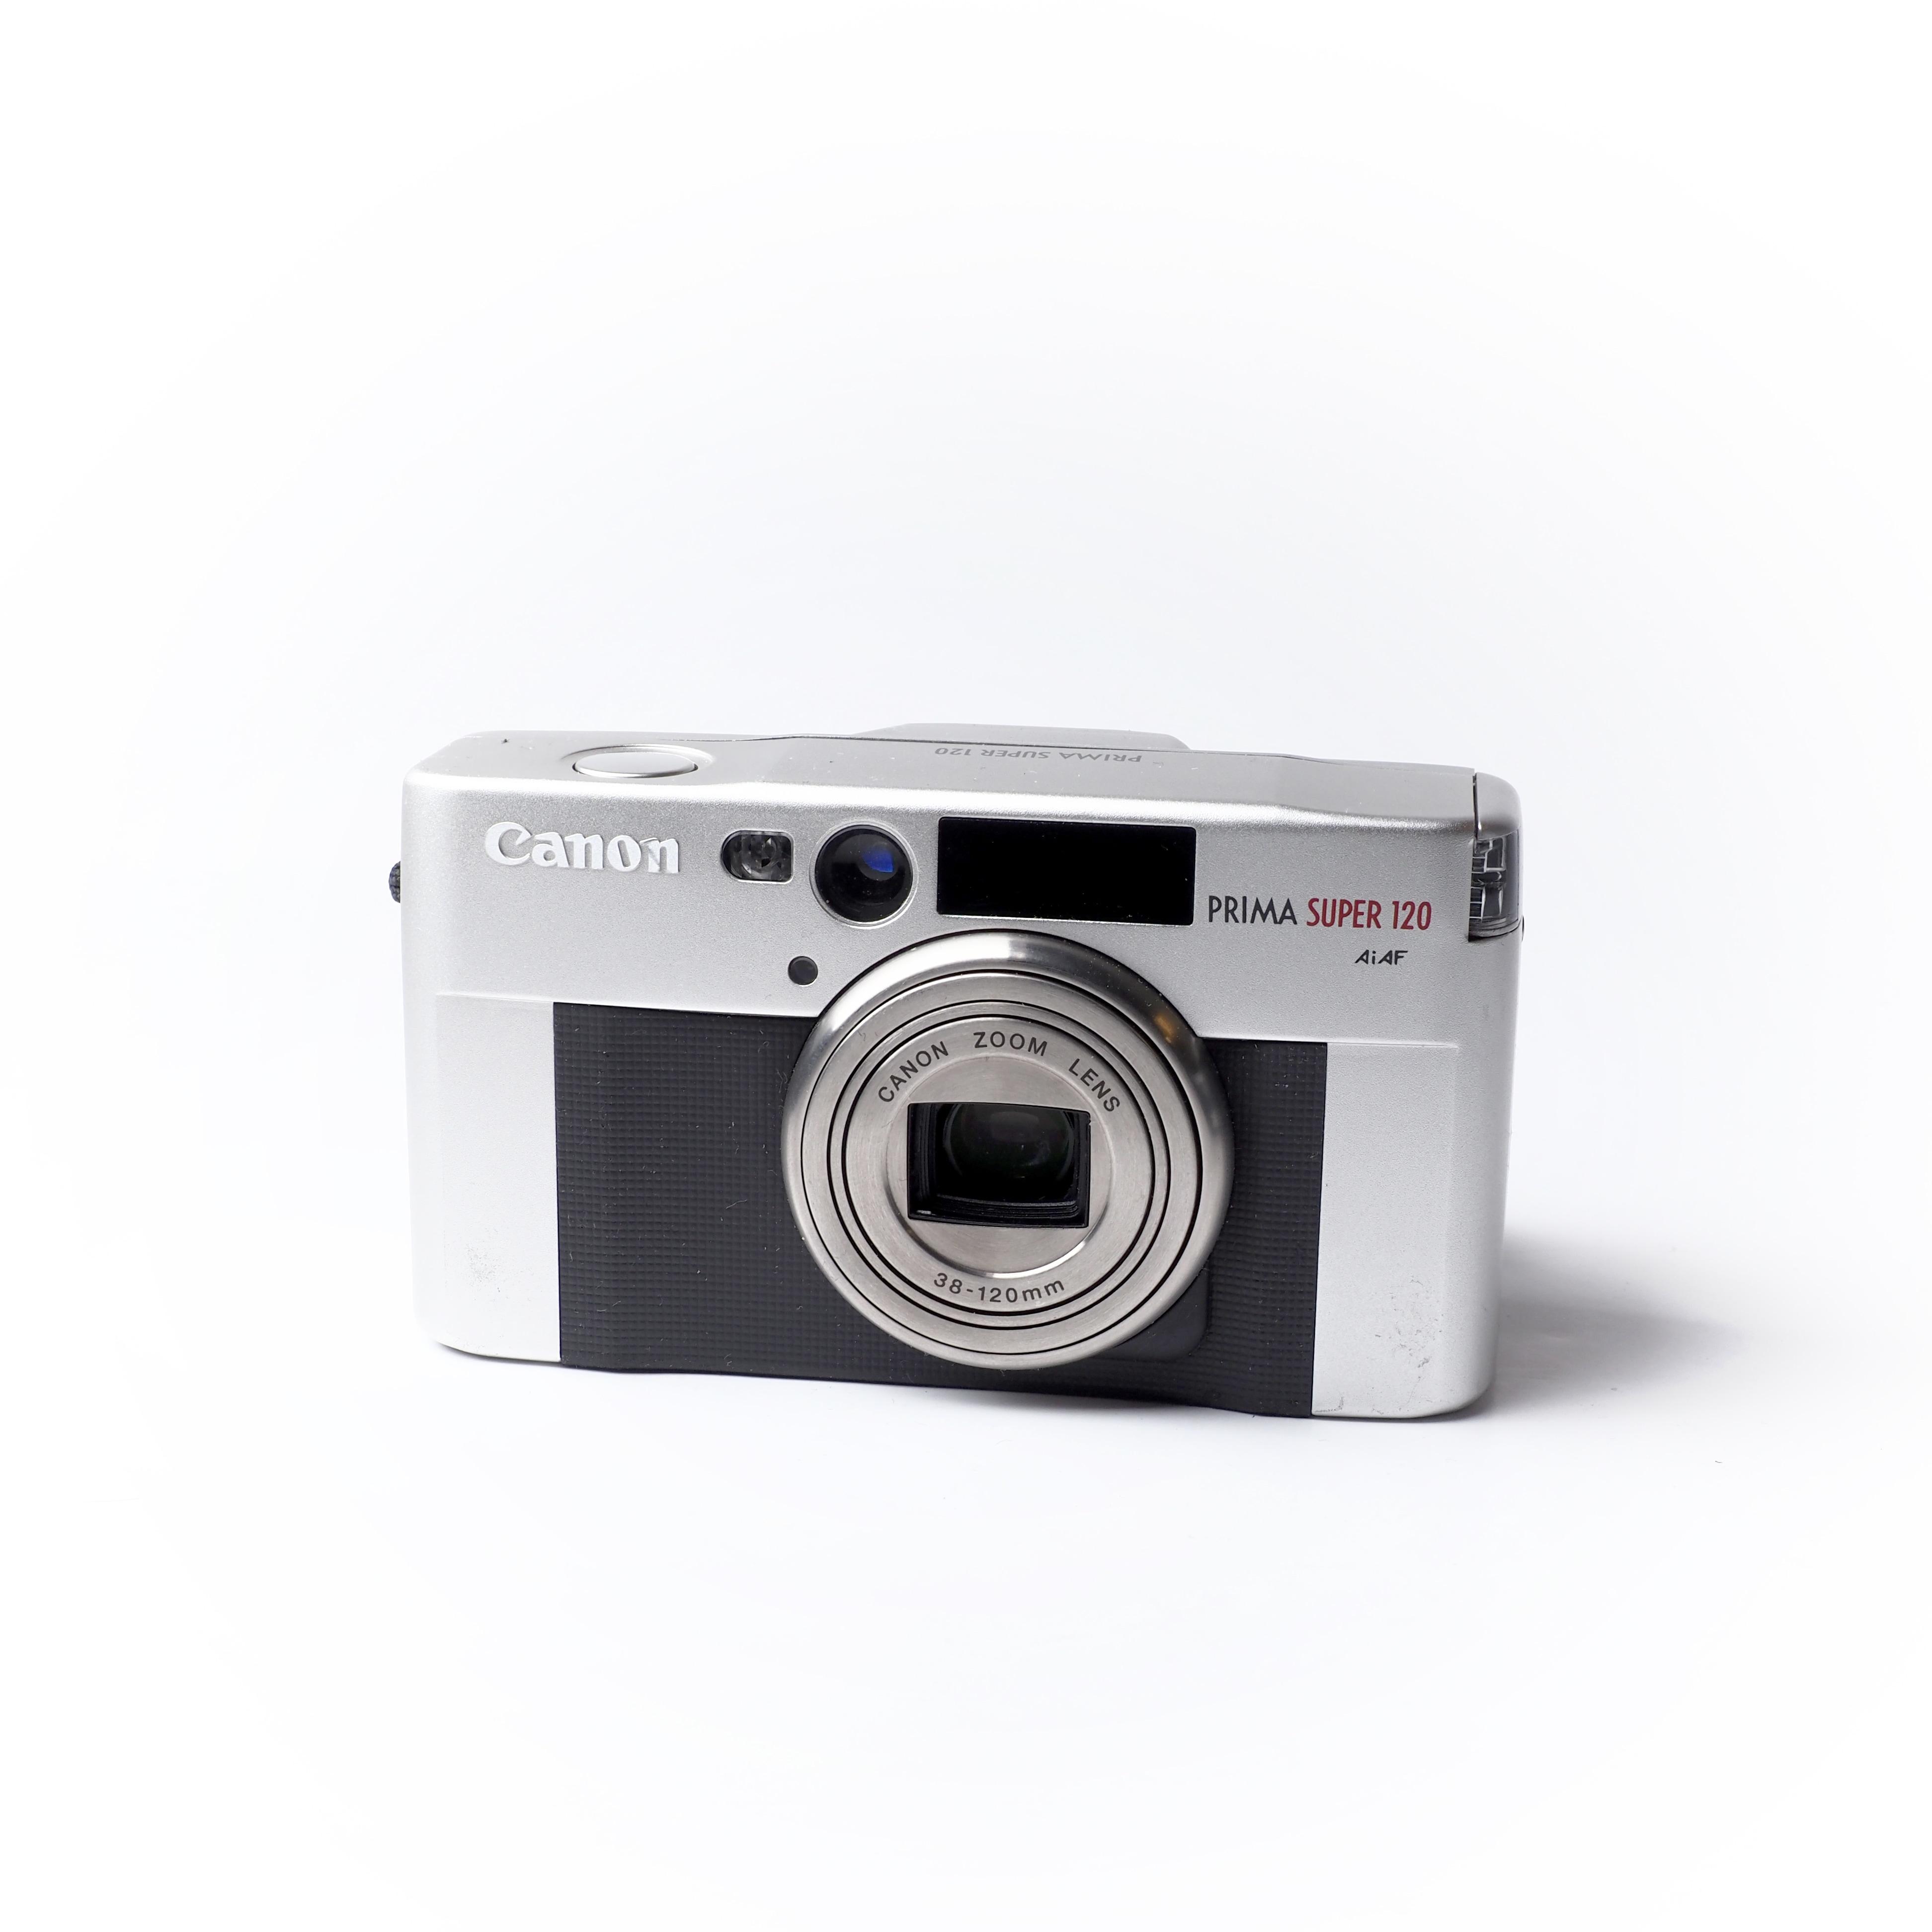 Canon Prima Super 120 AF - BEGAGNAT